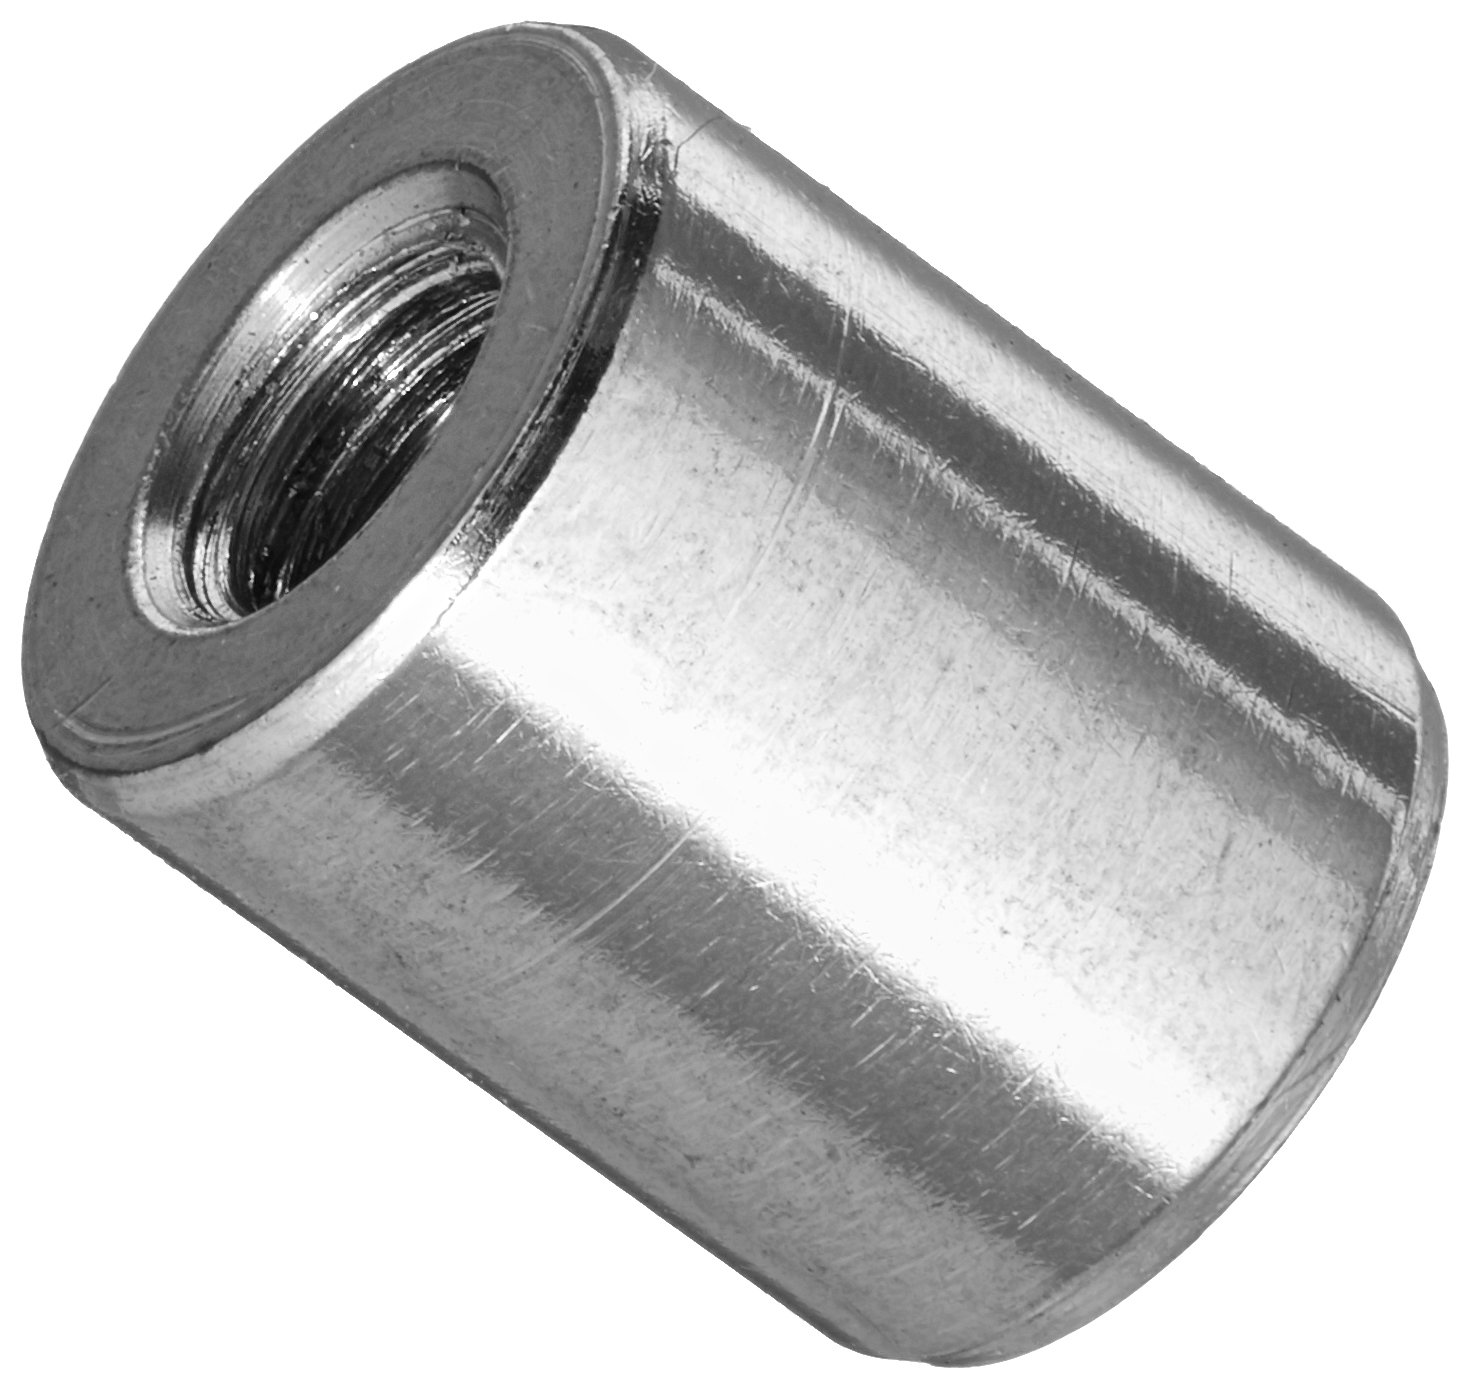 Hex Coupling Nuts//Steel//Zinc // 200 Pc 1//2 AF 5//16-18 X 7//8 Carton